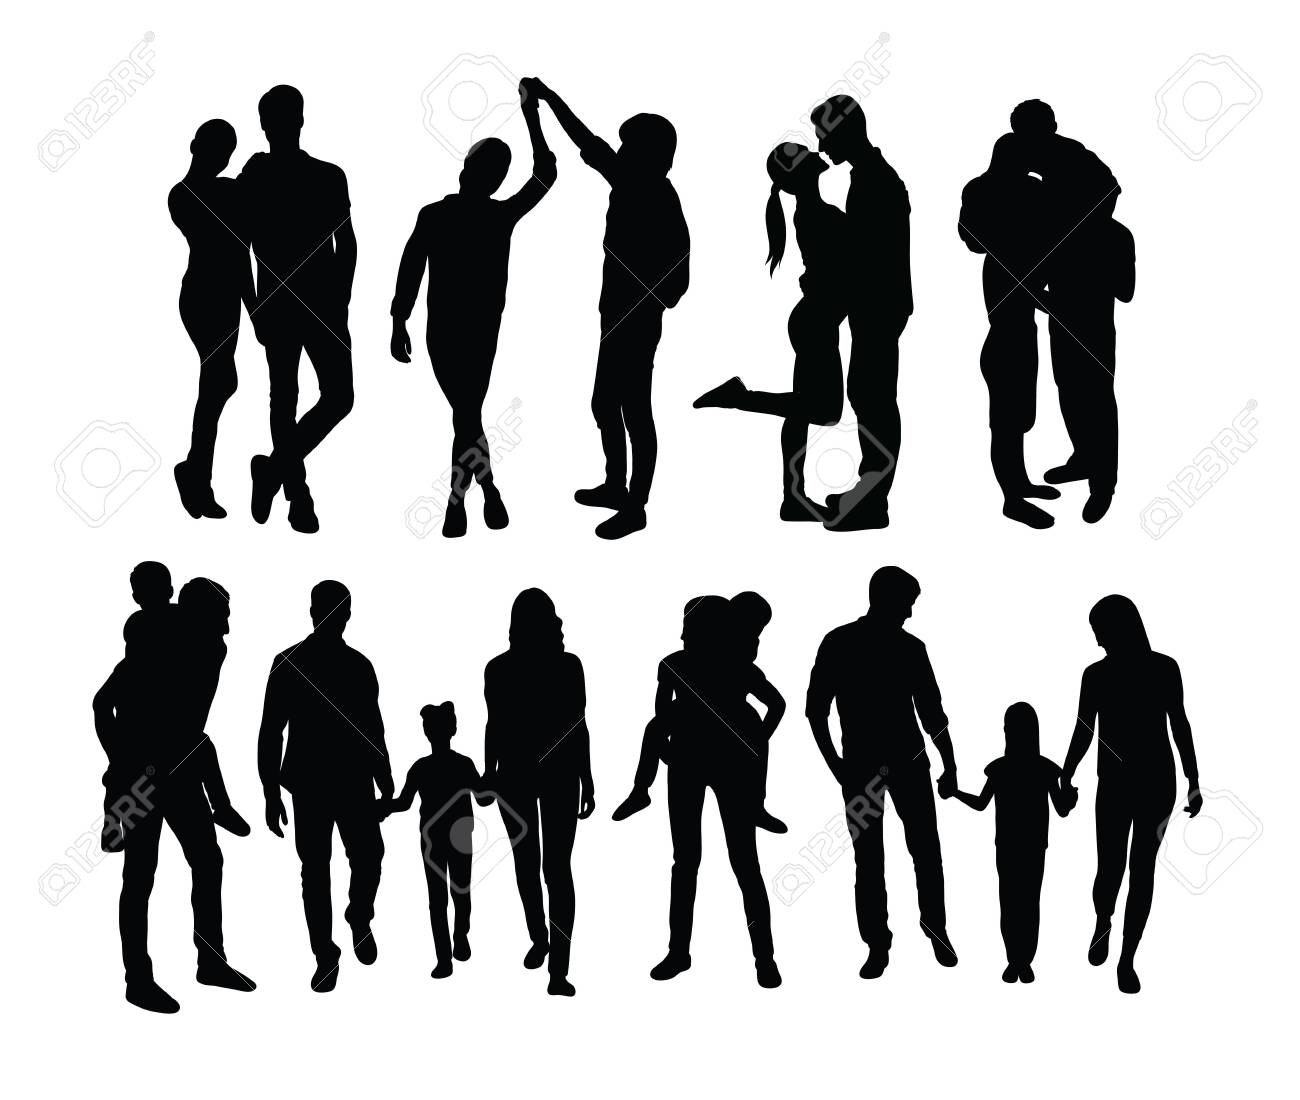 Happy Family Silhouettes, art vector design - 131447333